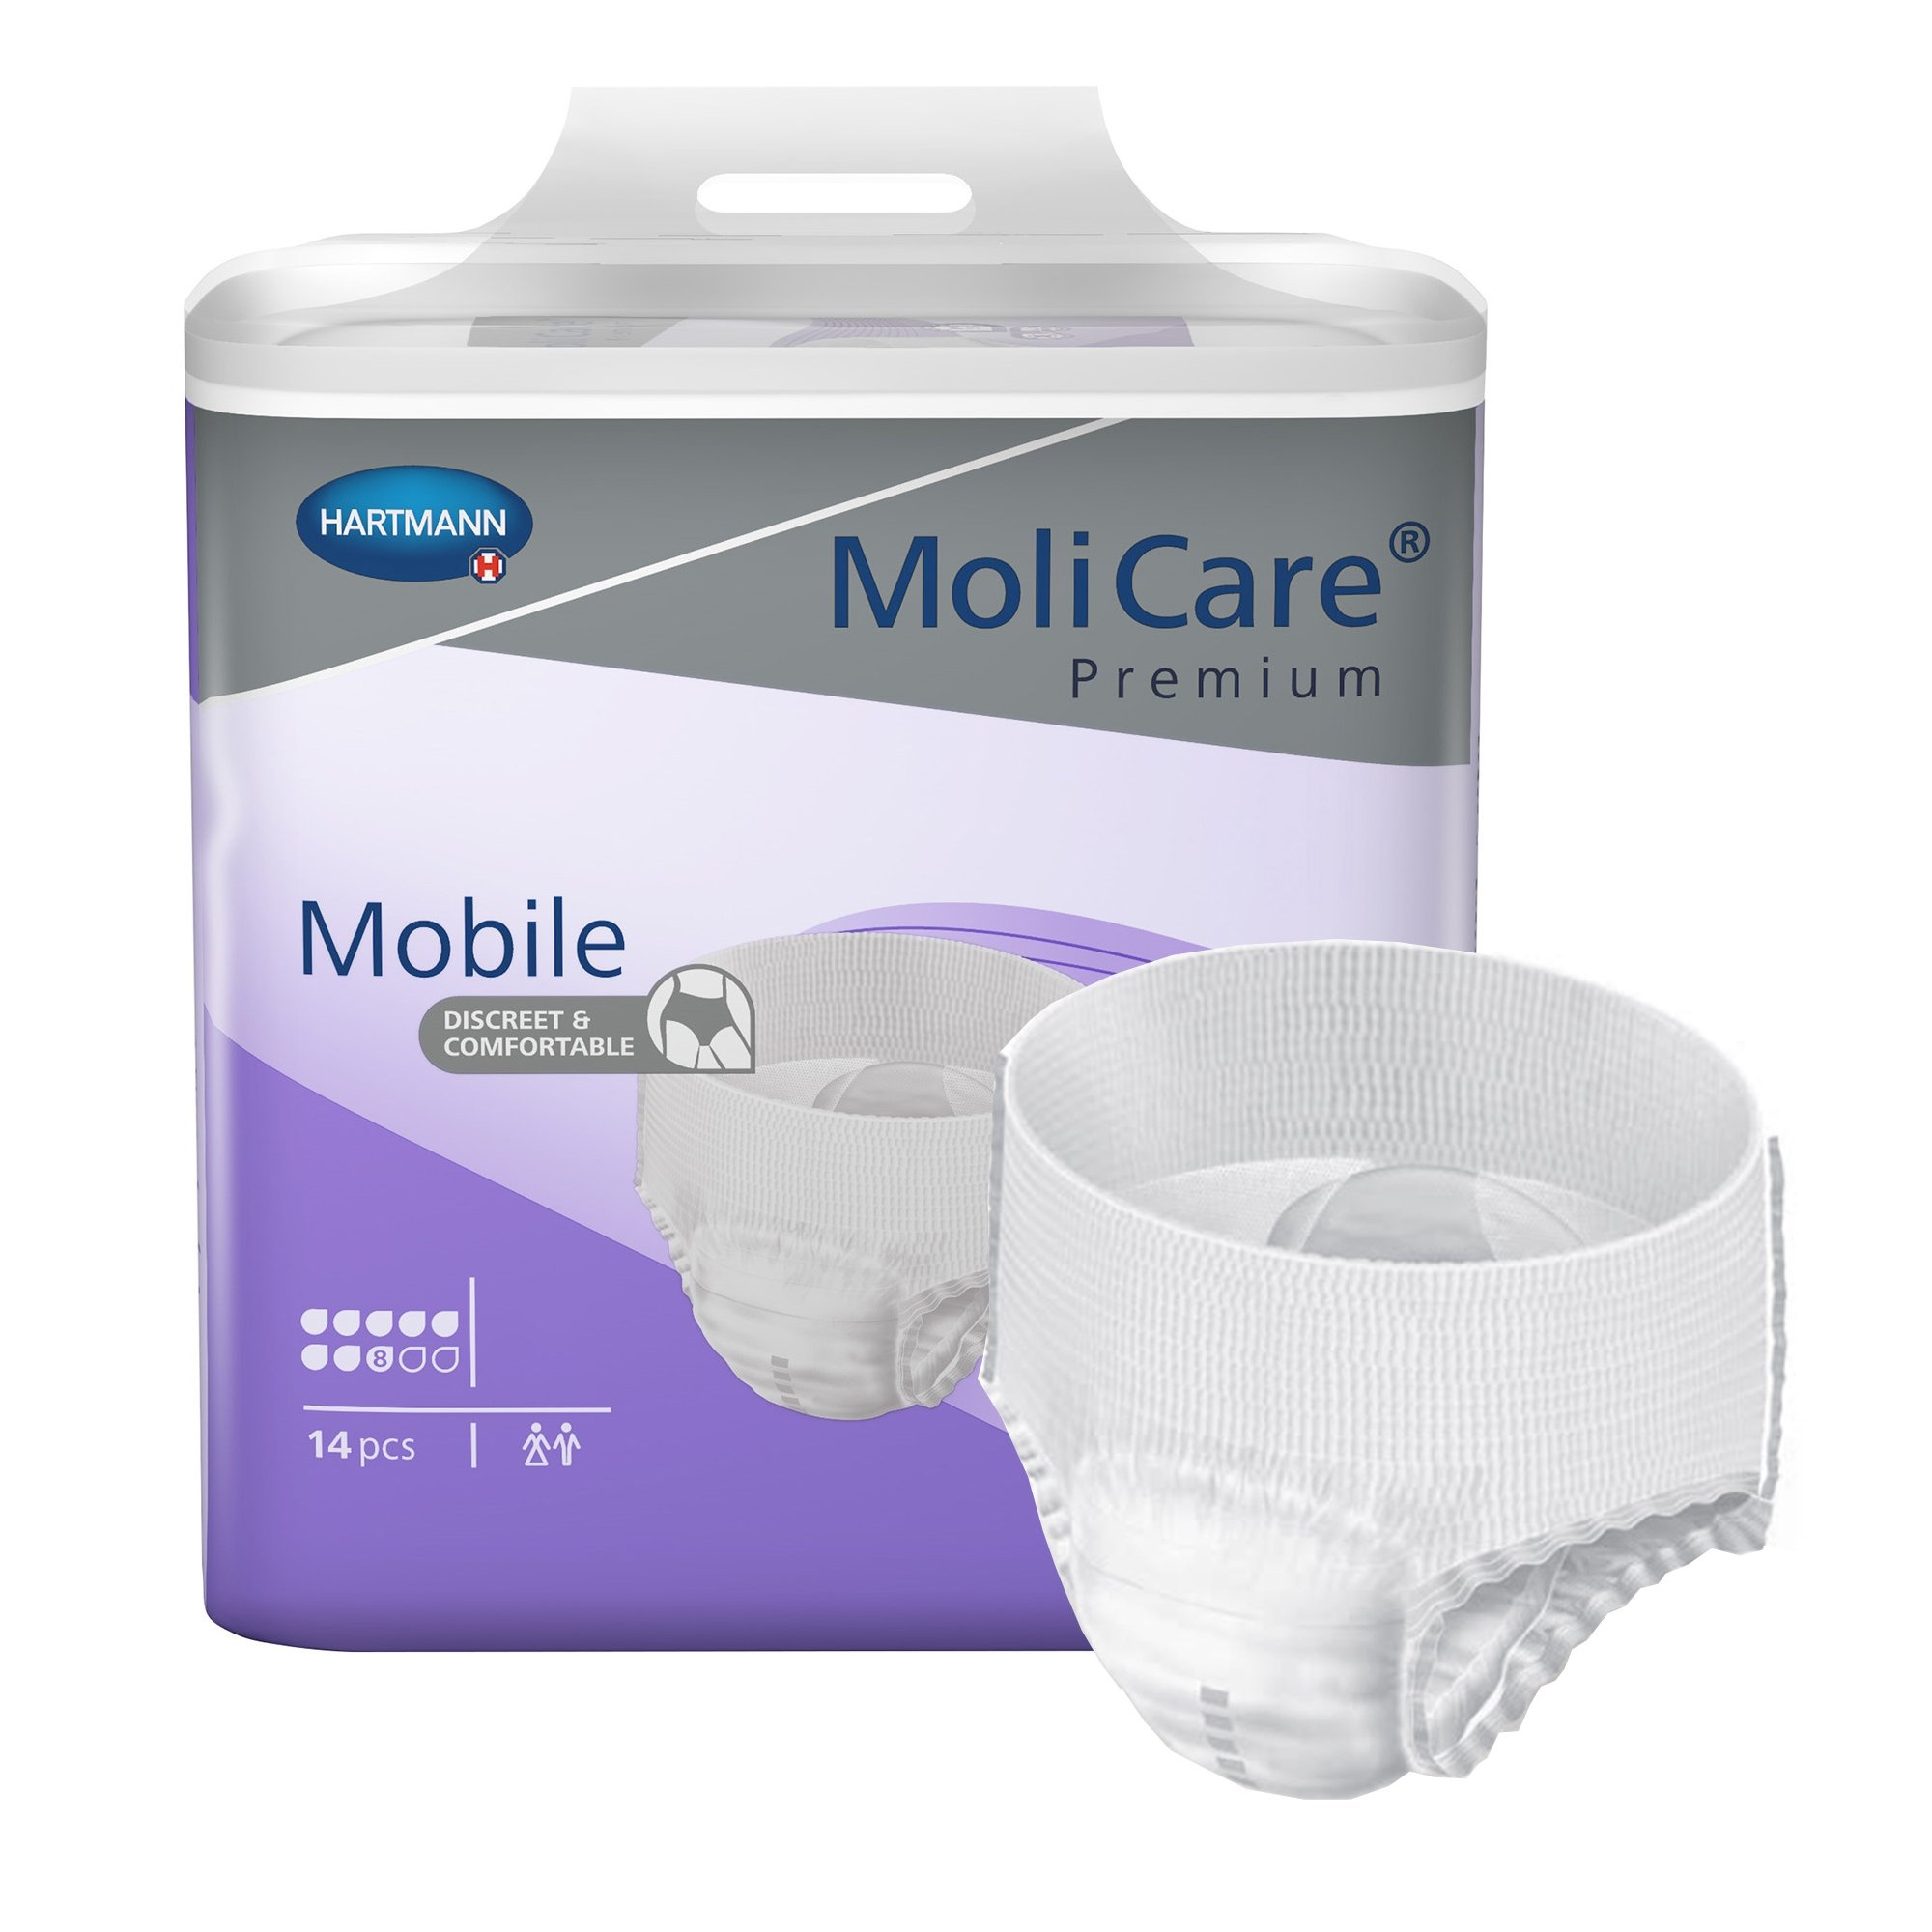 "MoliCare Premium Mobile Pull-Up Underwear, 8 Drops Heavy Absorbency, 915872, Medium (31-47"") - Case of 42"